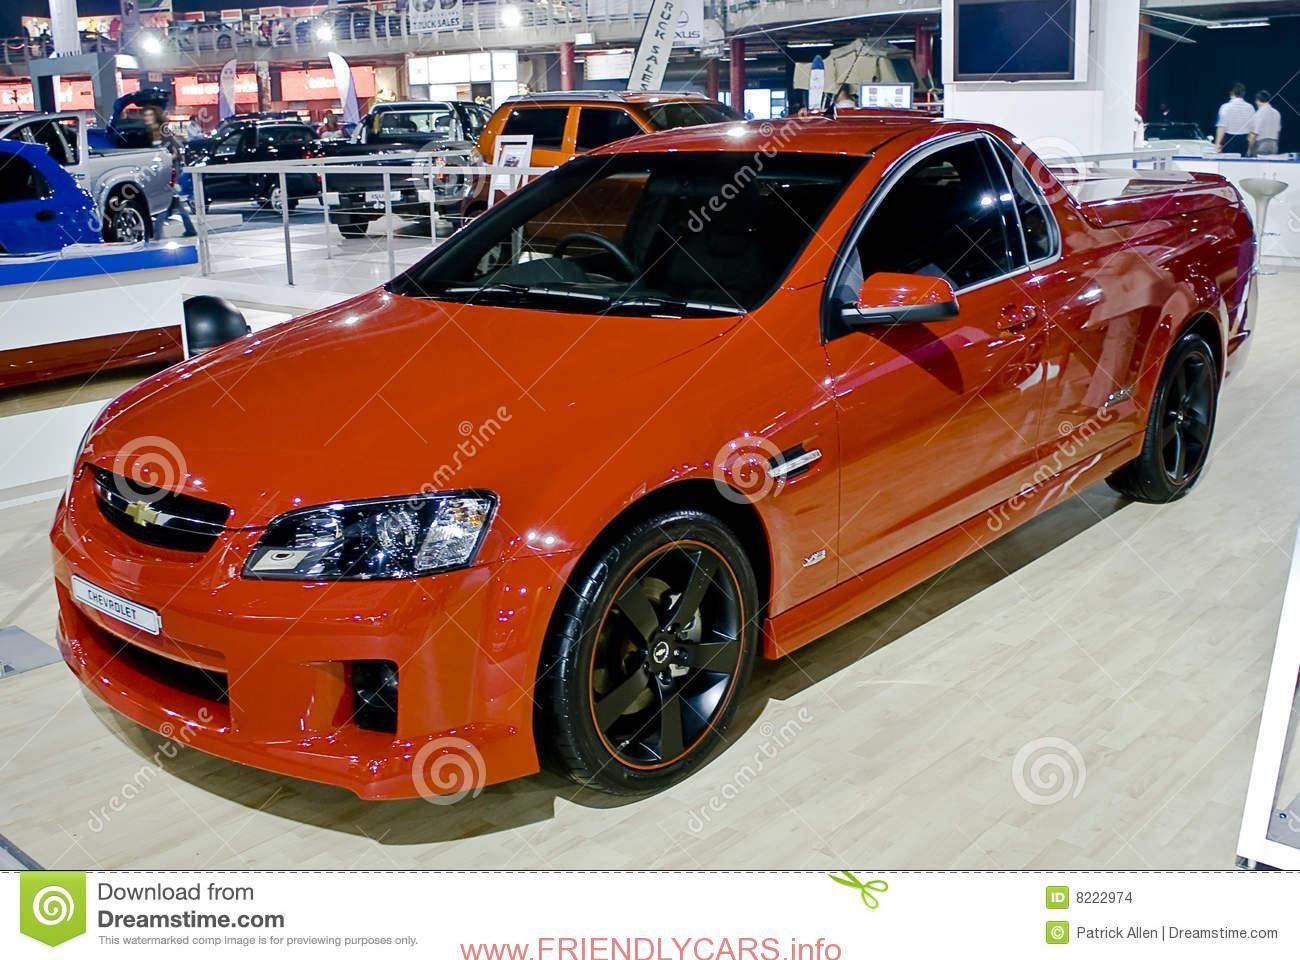 medium resolution of cool chevrolet ss lumina sport car images hd chevrolet lumina ss ute mph editorial stock image image 8222974